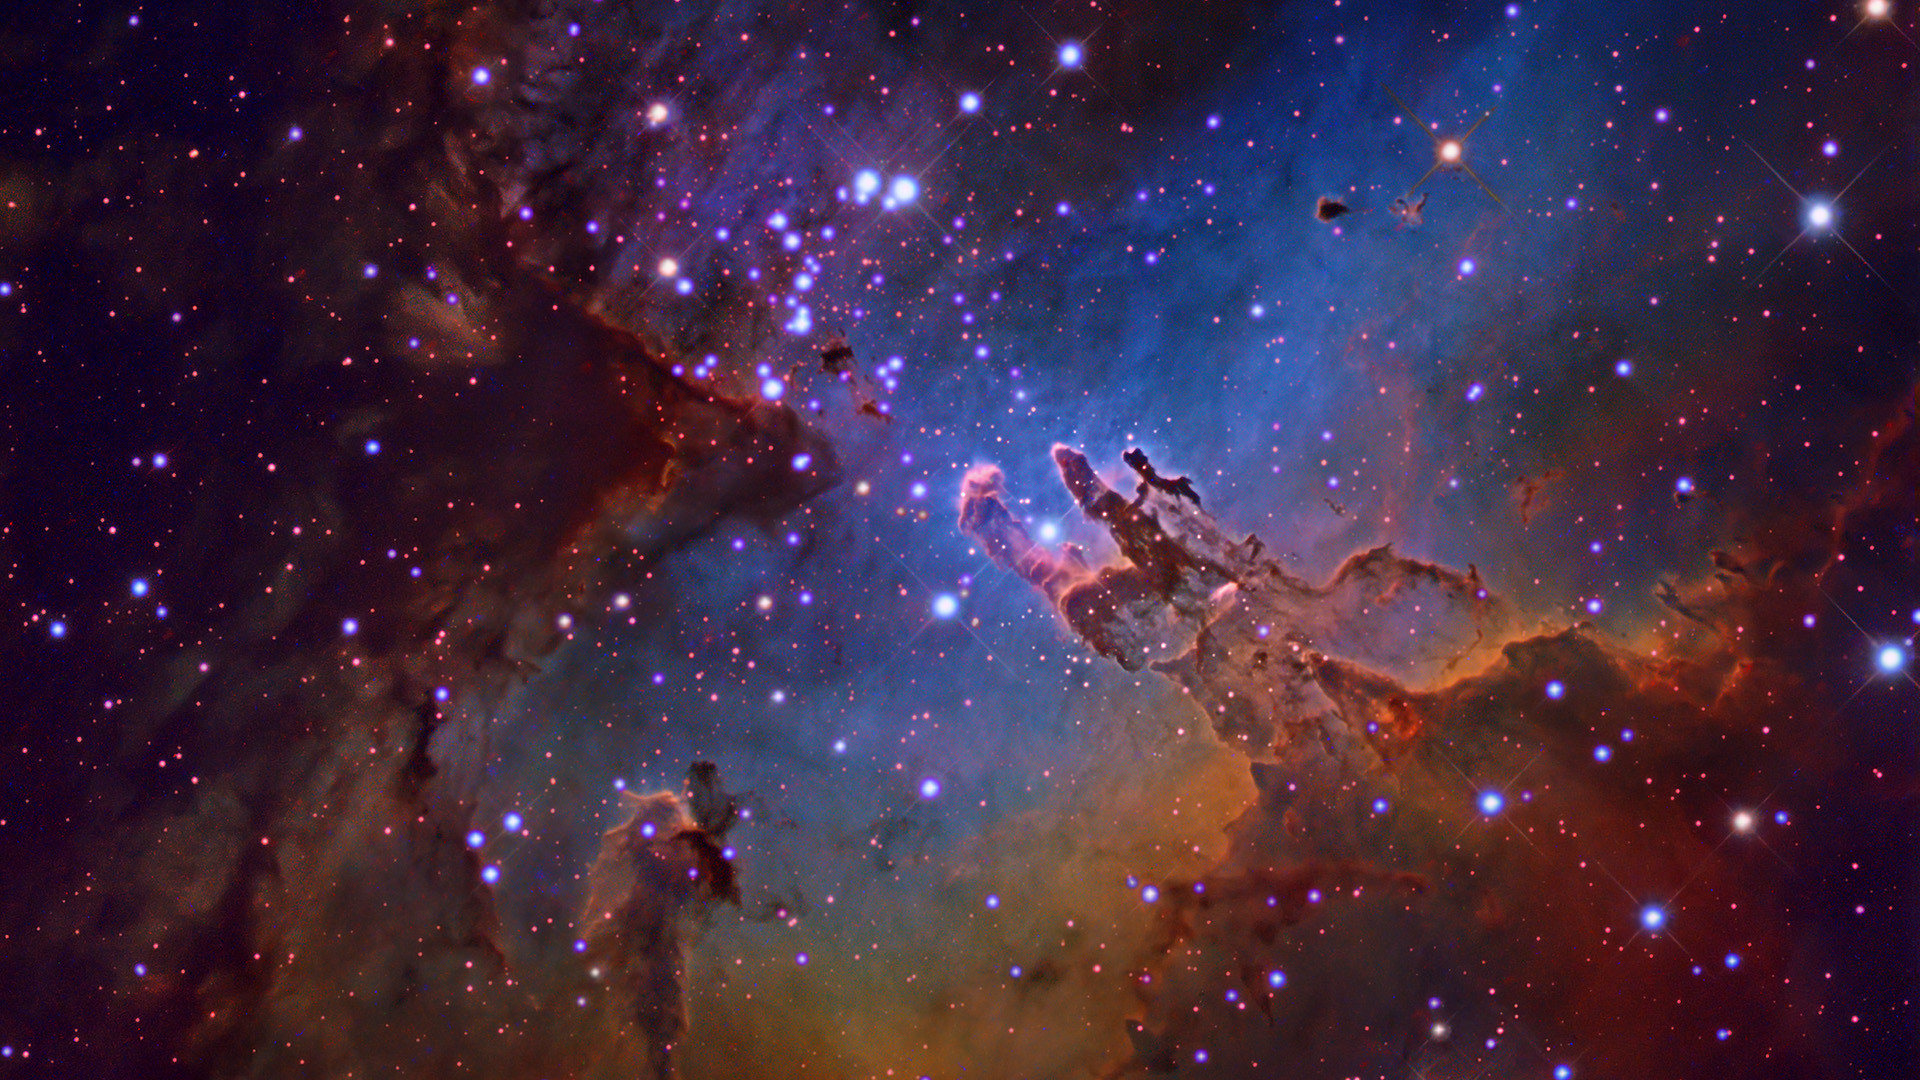 1920x1080 Purple And Blue Space Nebula Wallpaper